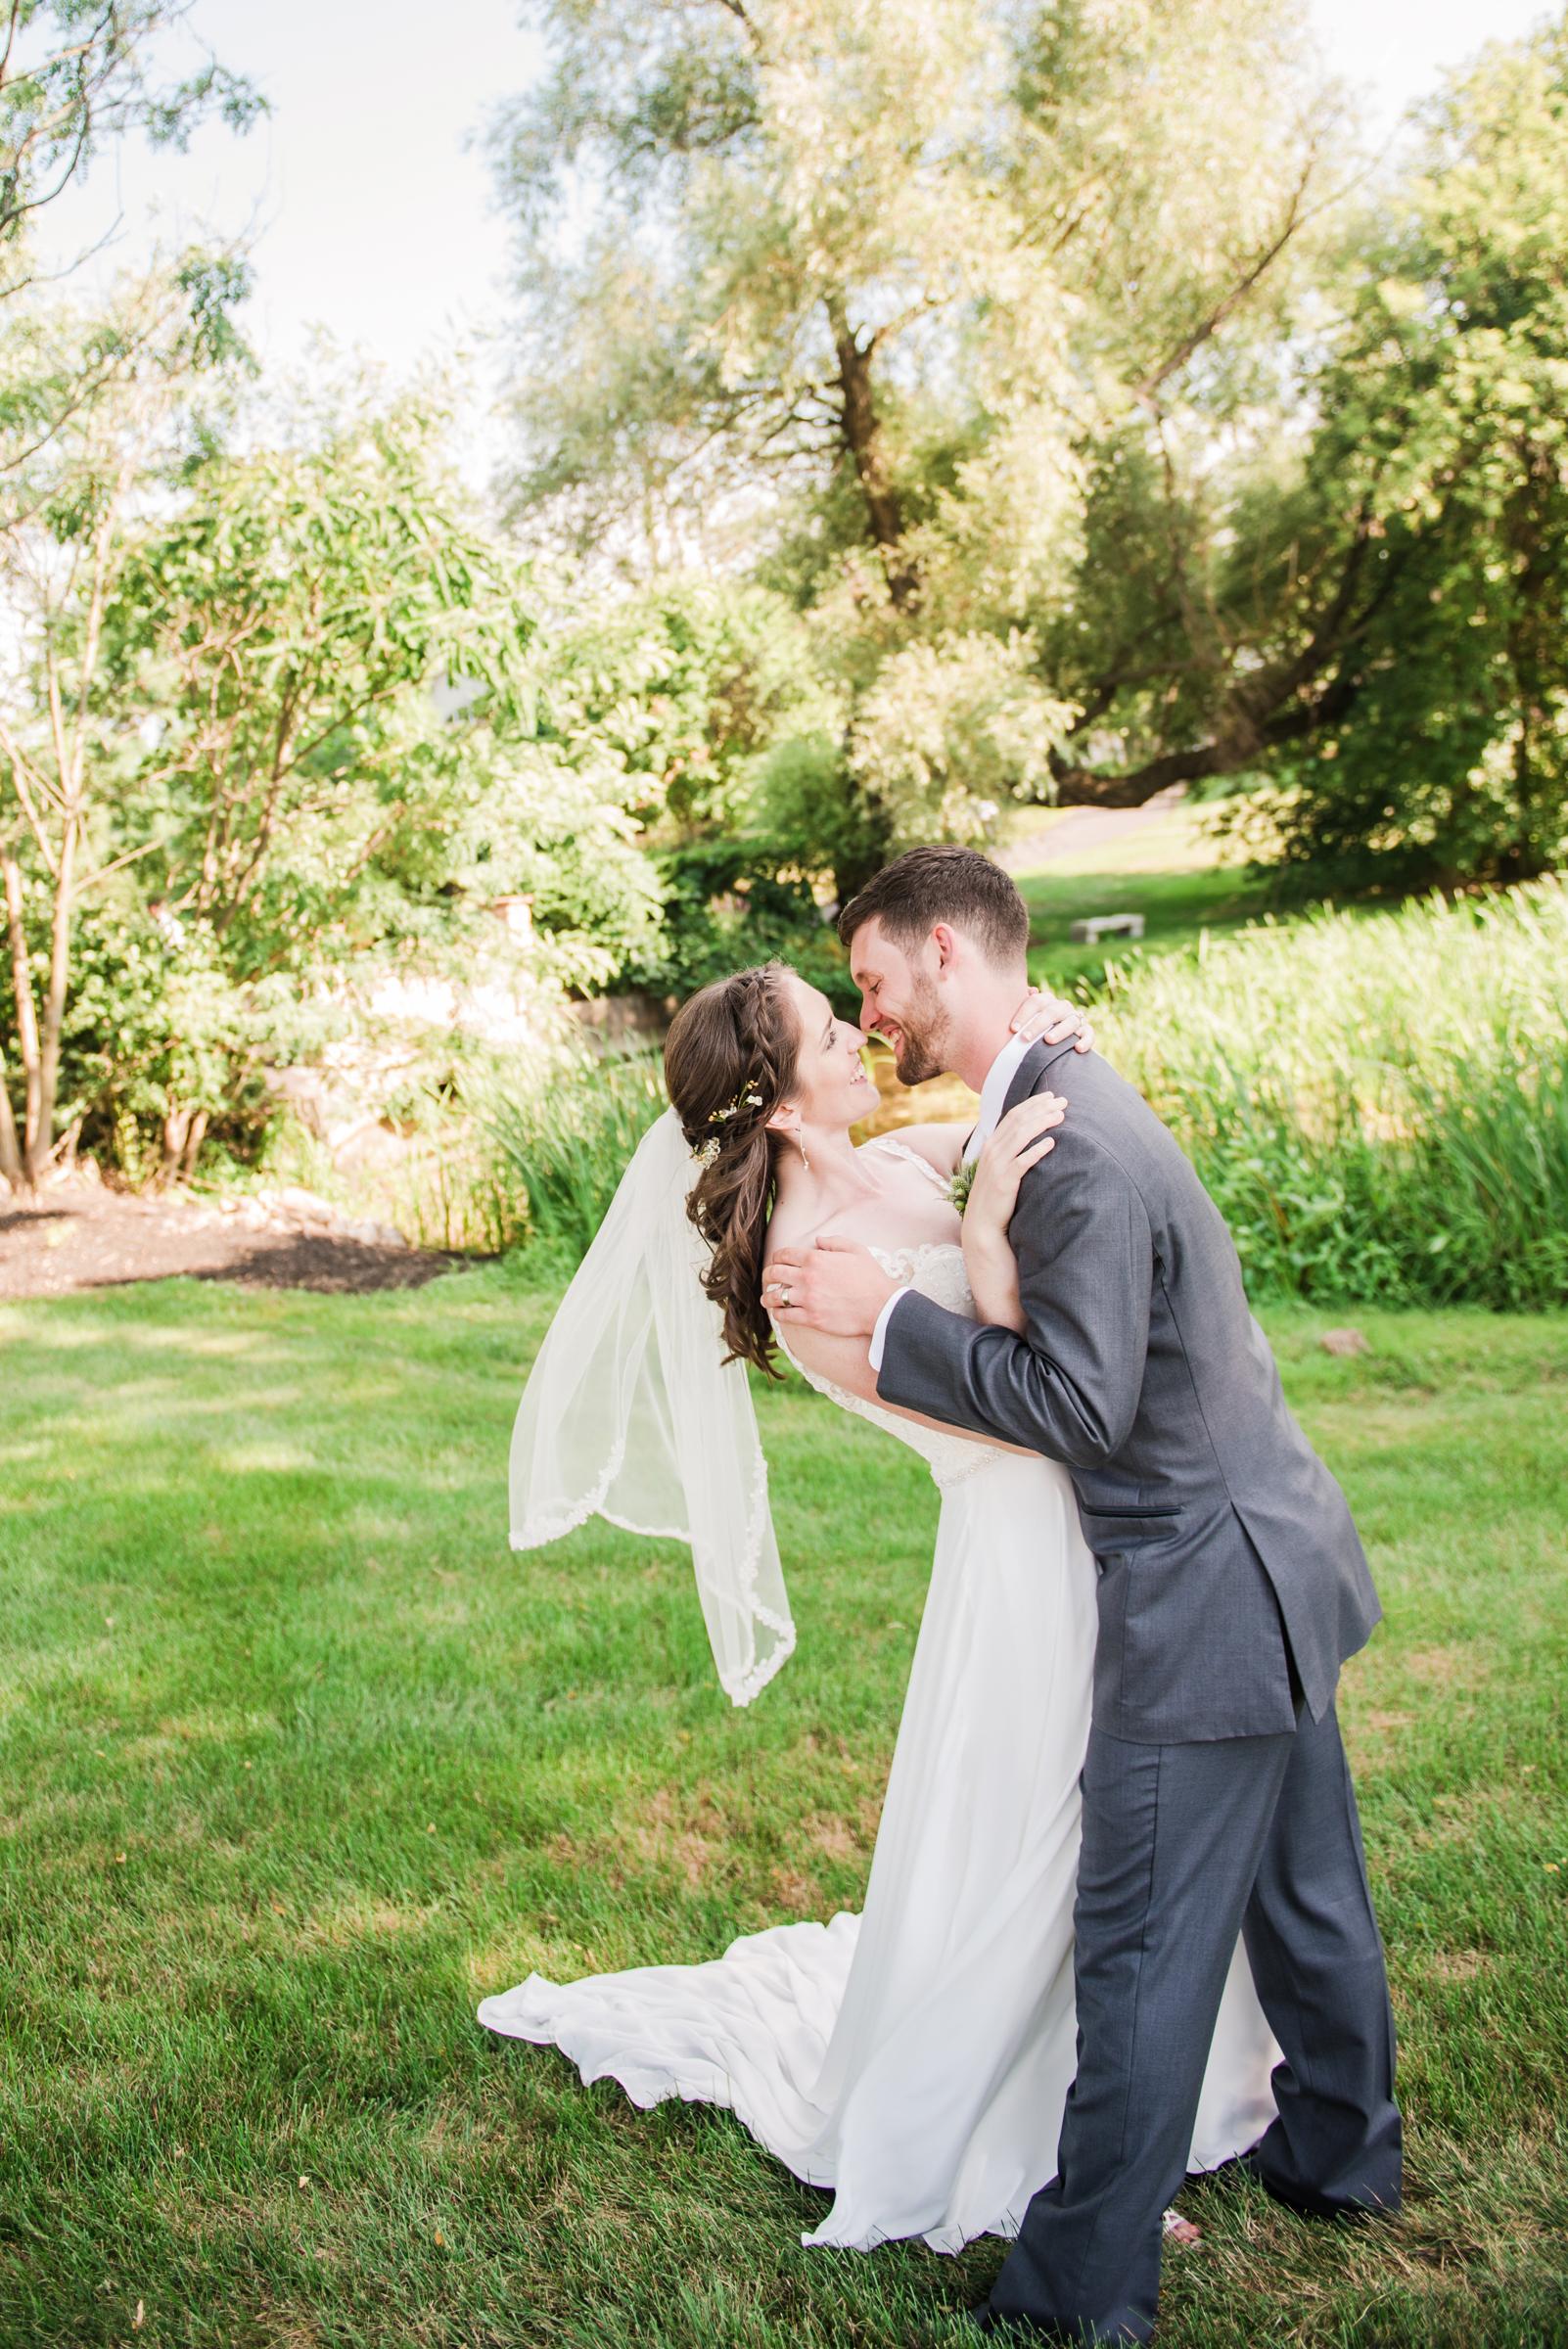 Jerris_Wadsworth_Wedding_Barn_Rochester_Wedding_JILL_STUDIO_Rochester_NY_Photographer_DSC_2776.jpg